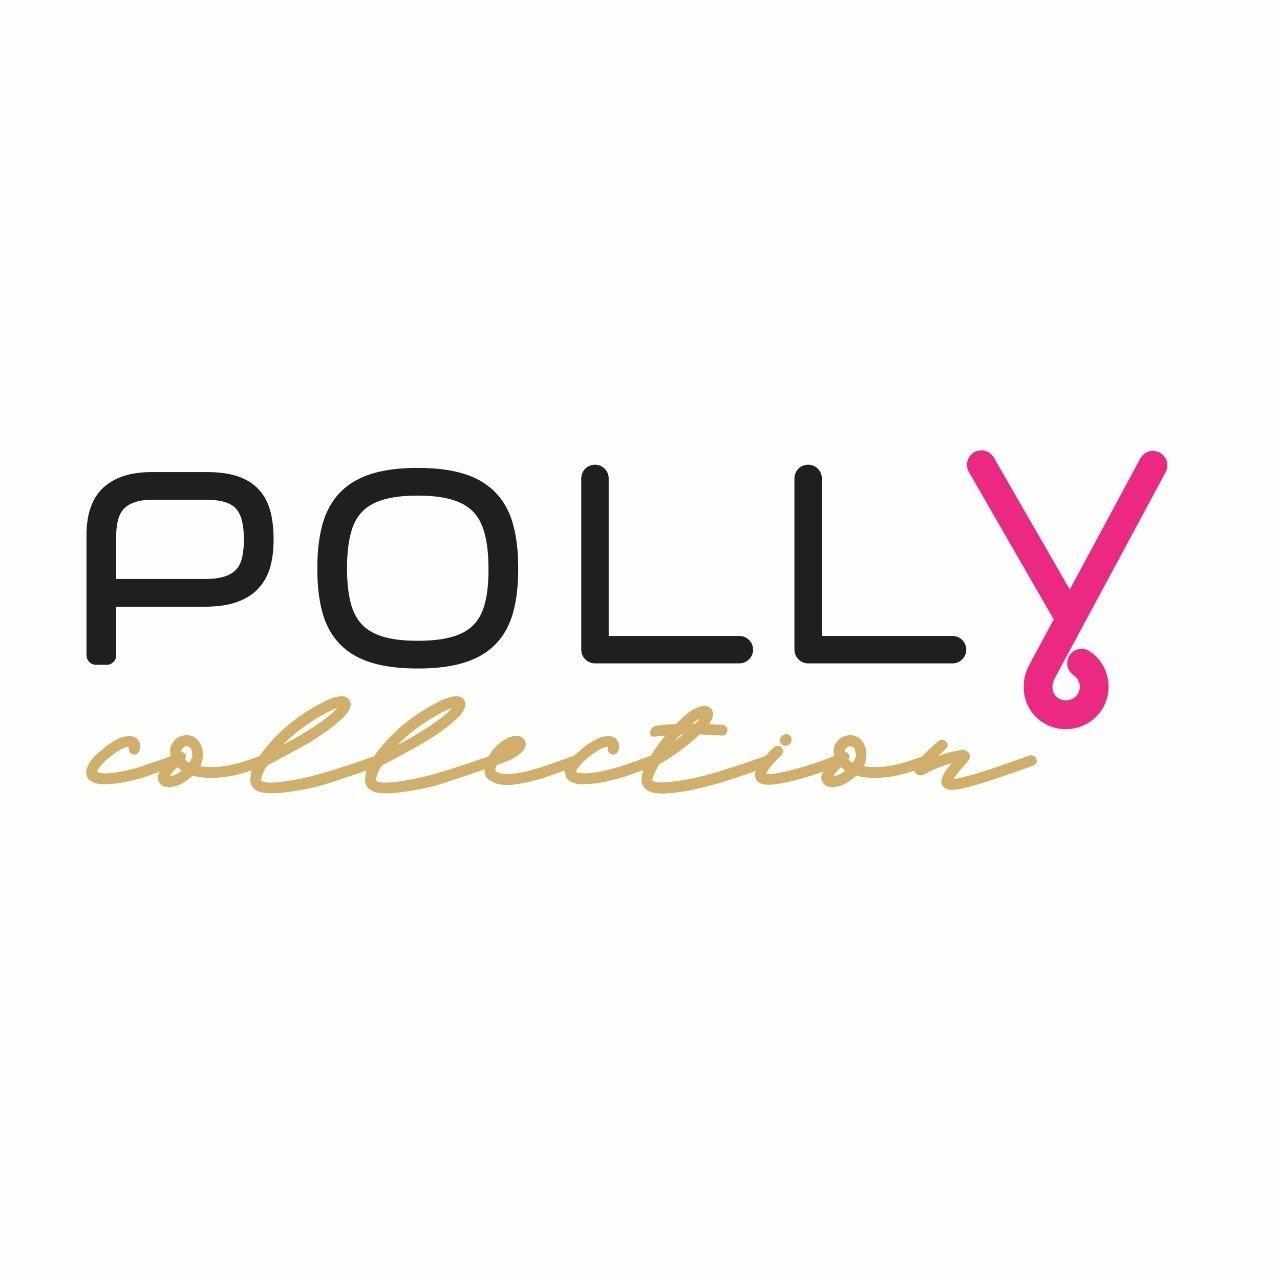 Polly Collection